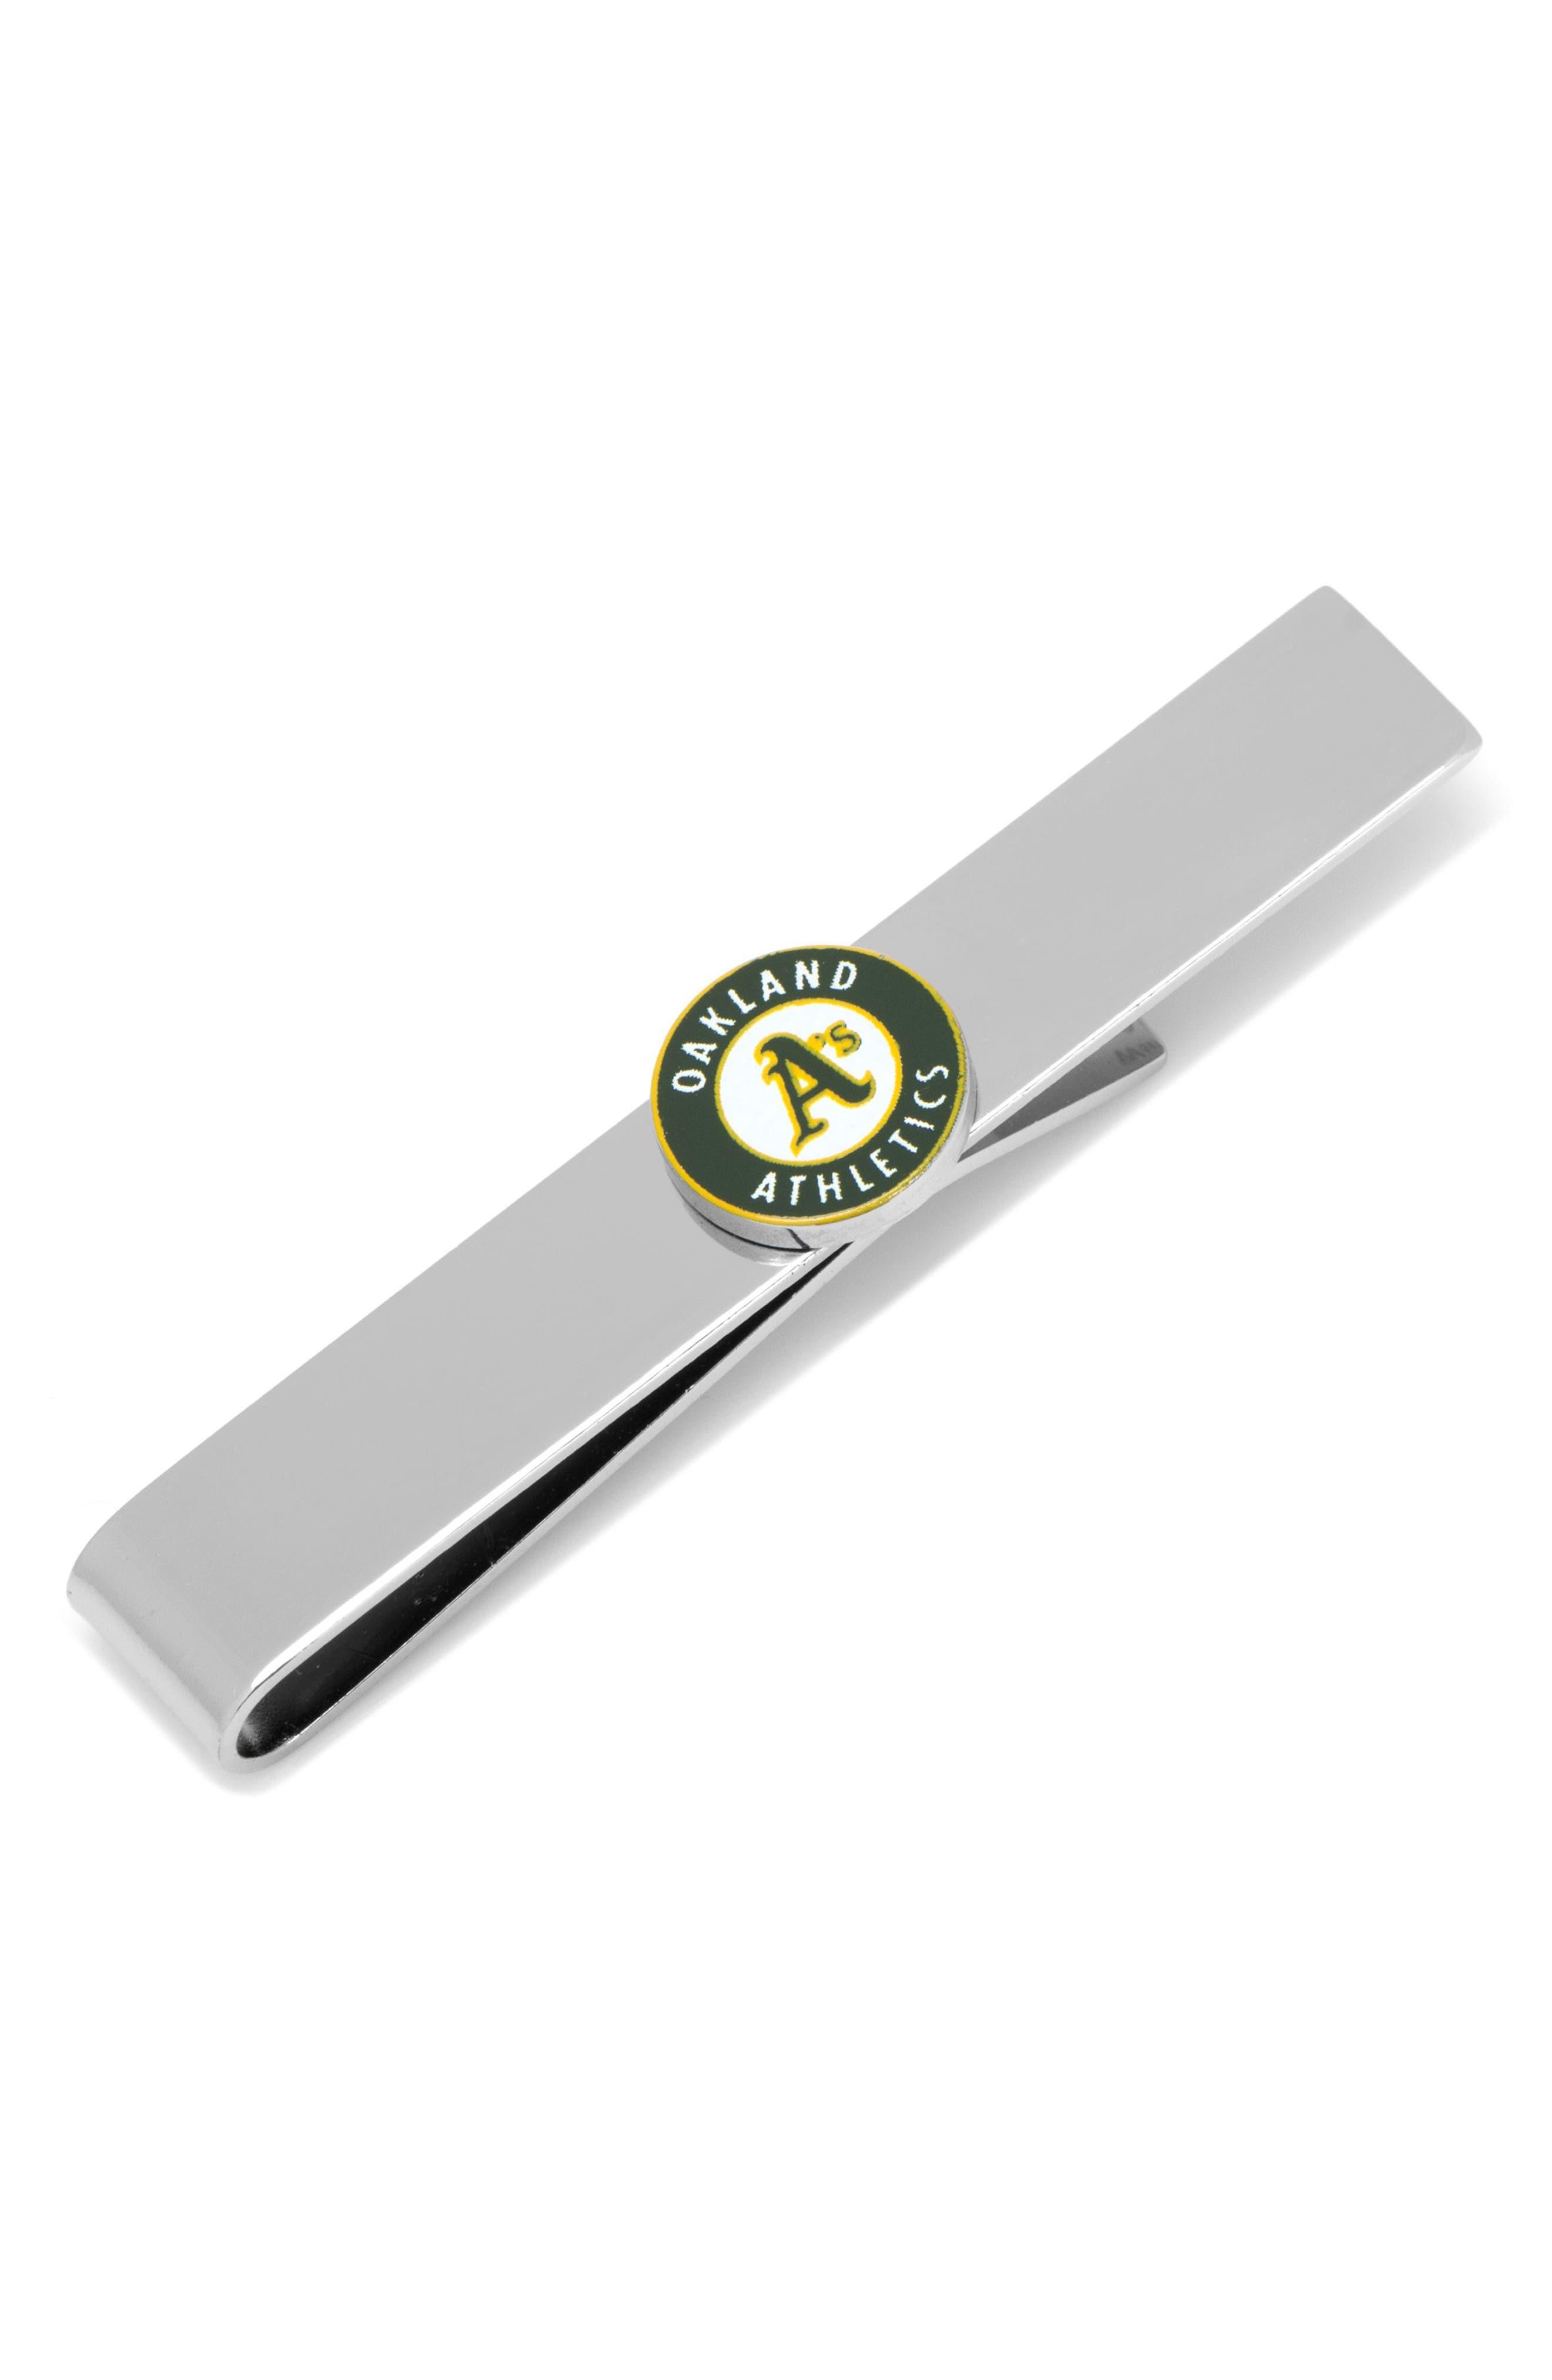 Oakland Athletics Tie Bar,                             Main thumbnail 1, color,                             GREEN/ SILVER